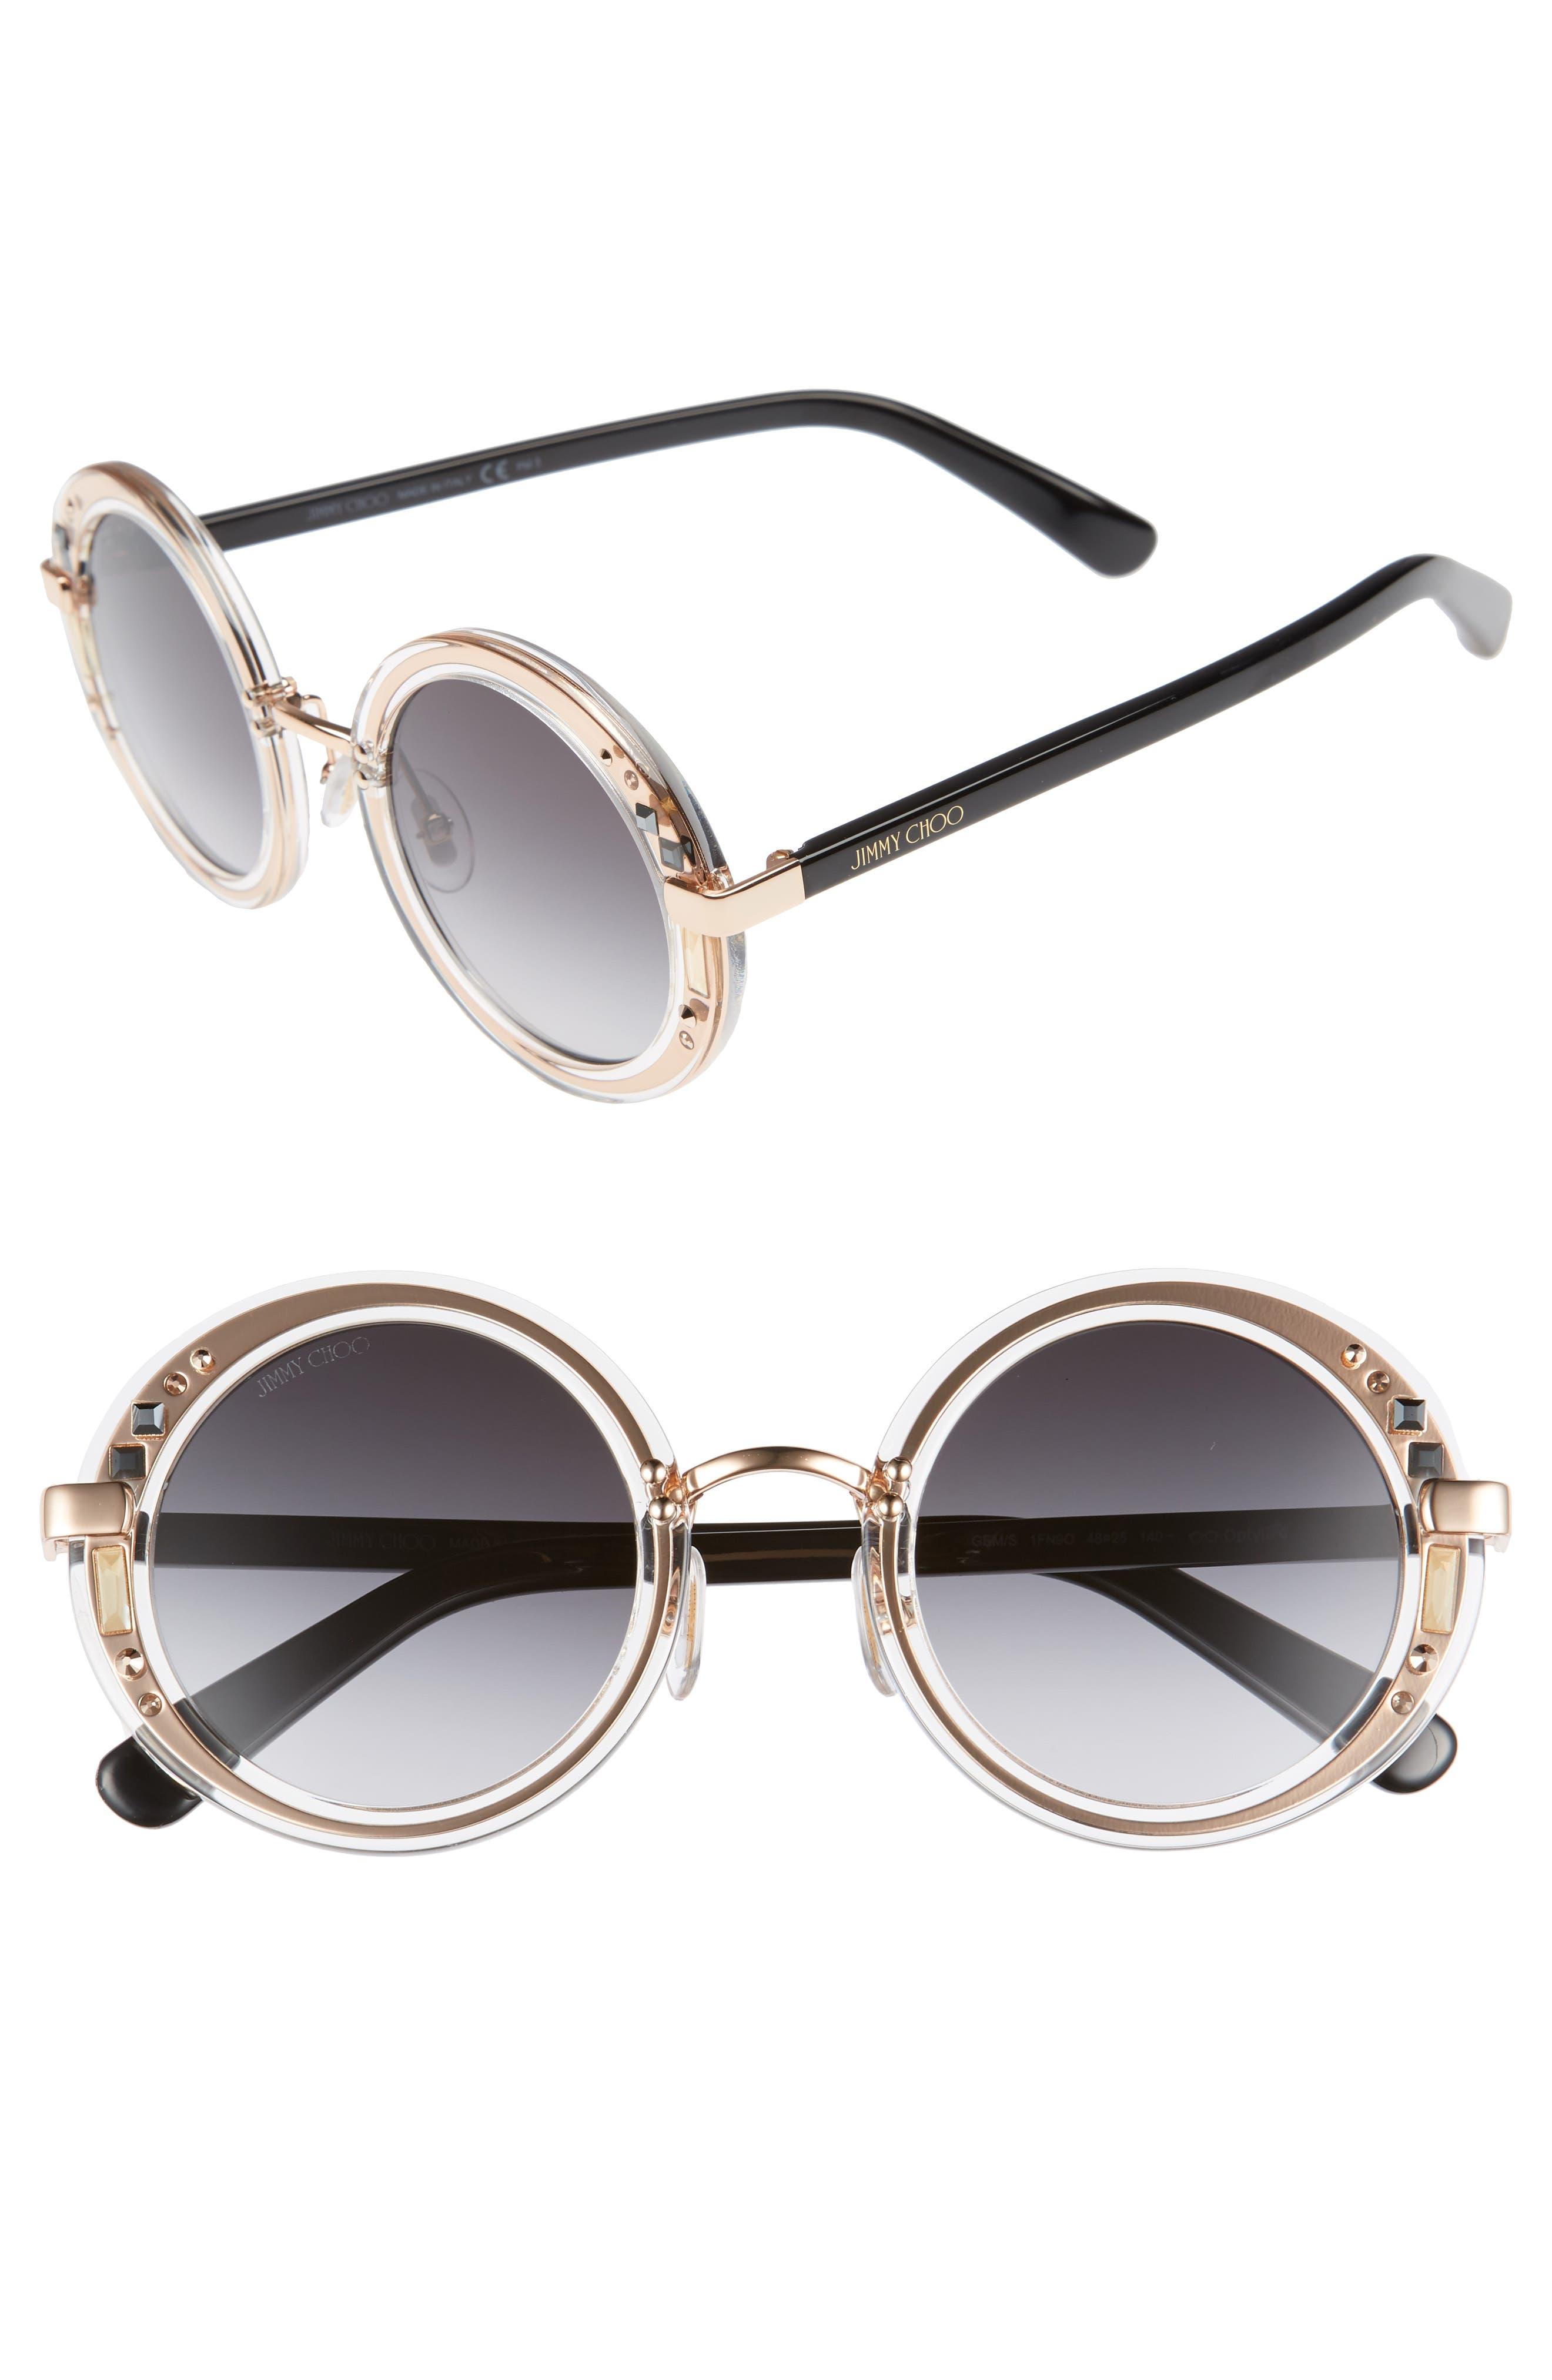 Gems 48mm Round Sunglasses,                             Main thumbnail 1, color,                             100